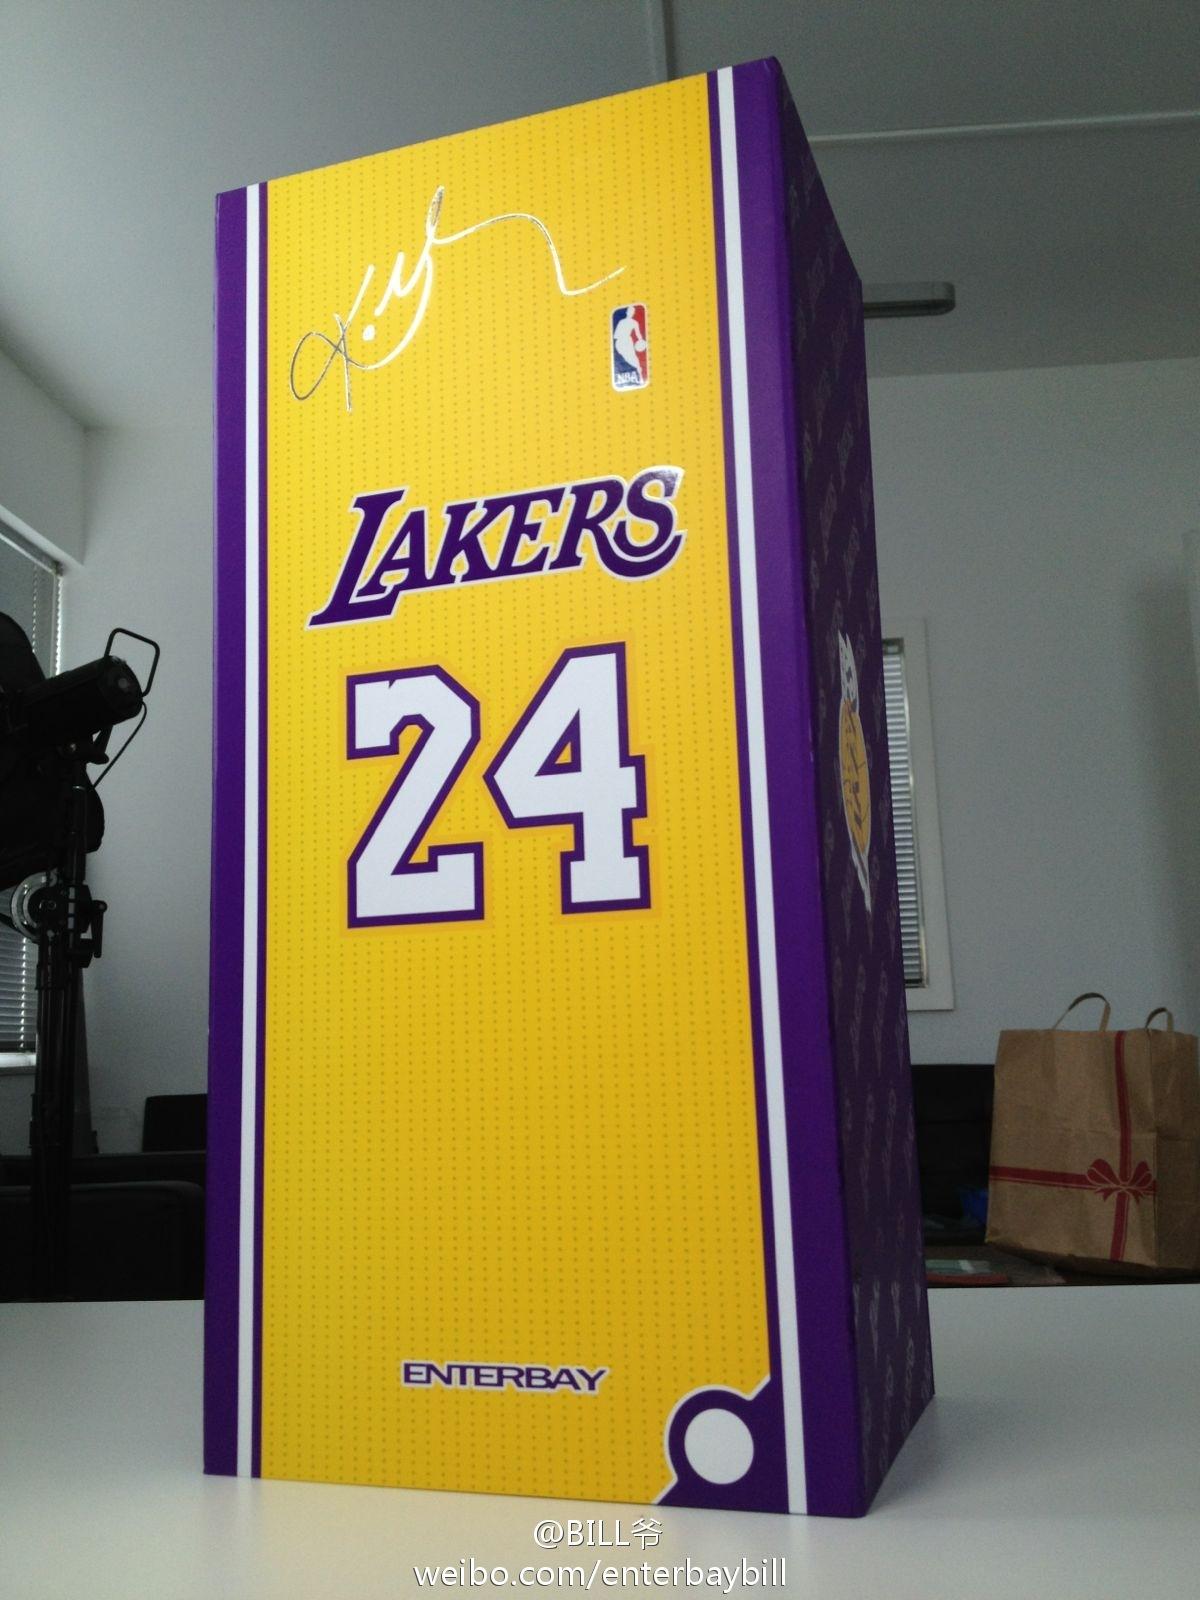 [ENTERBAY] NBA Real Masterpiece - Kobe Bryant!!! - Página 3 69464edejw1du6zujsvhcj